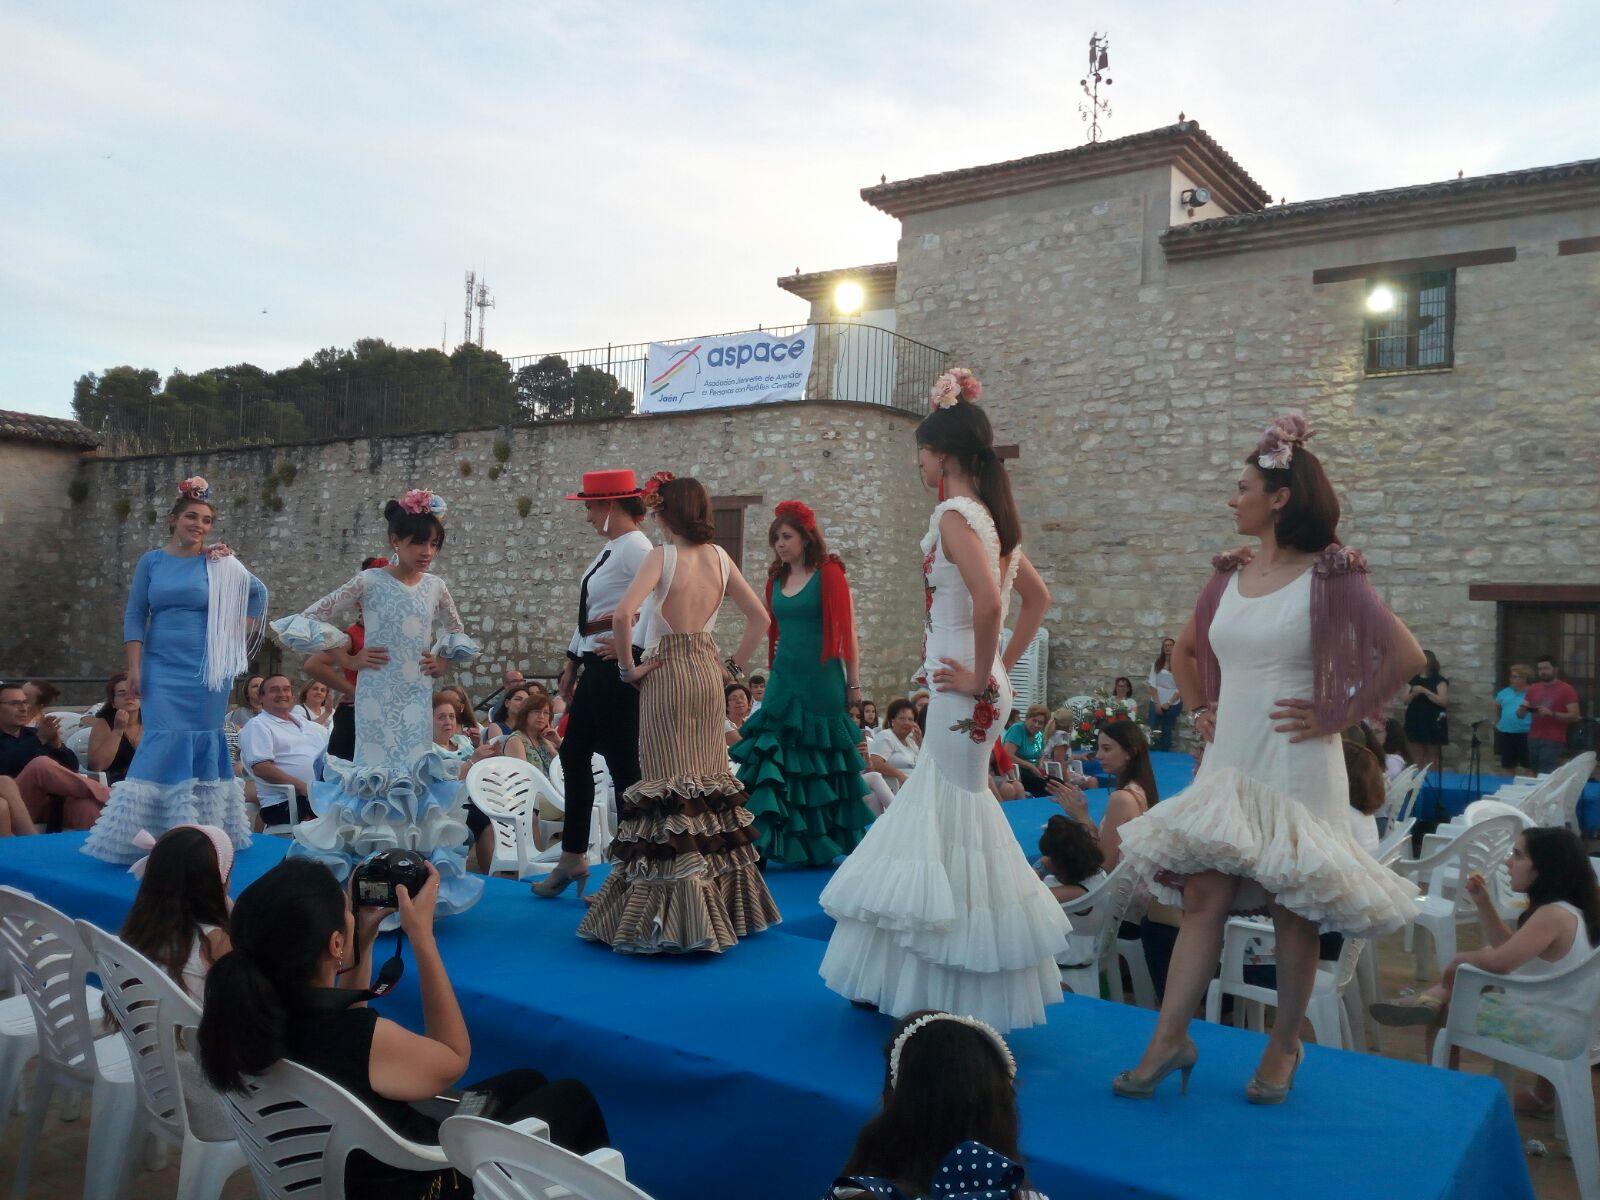 Torredonjimeno se vuelca con Aspace Jaén en una gran pasarela flamenca